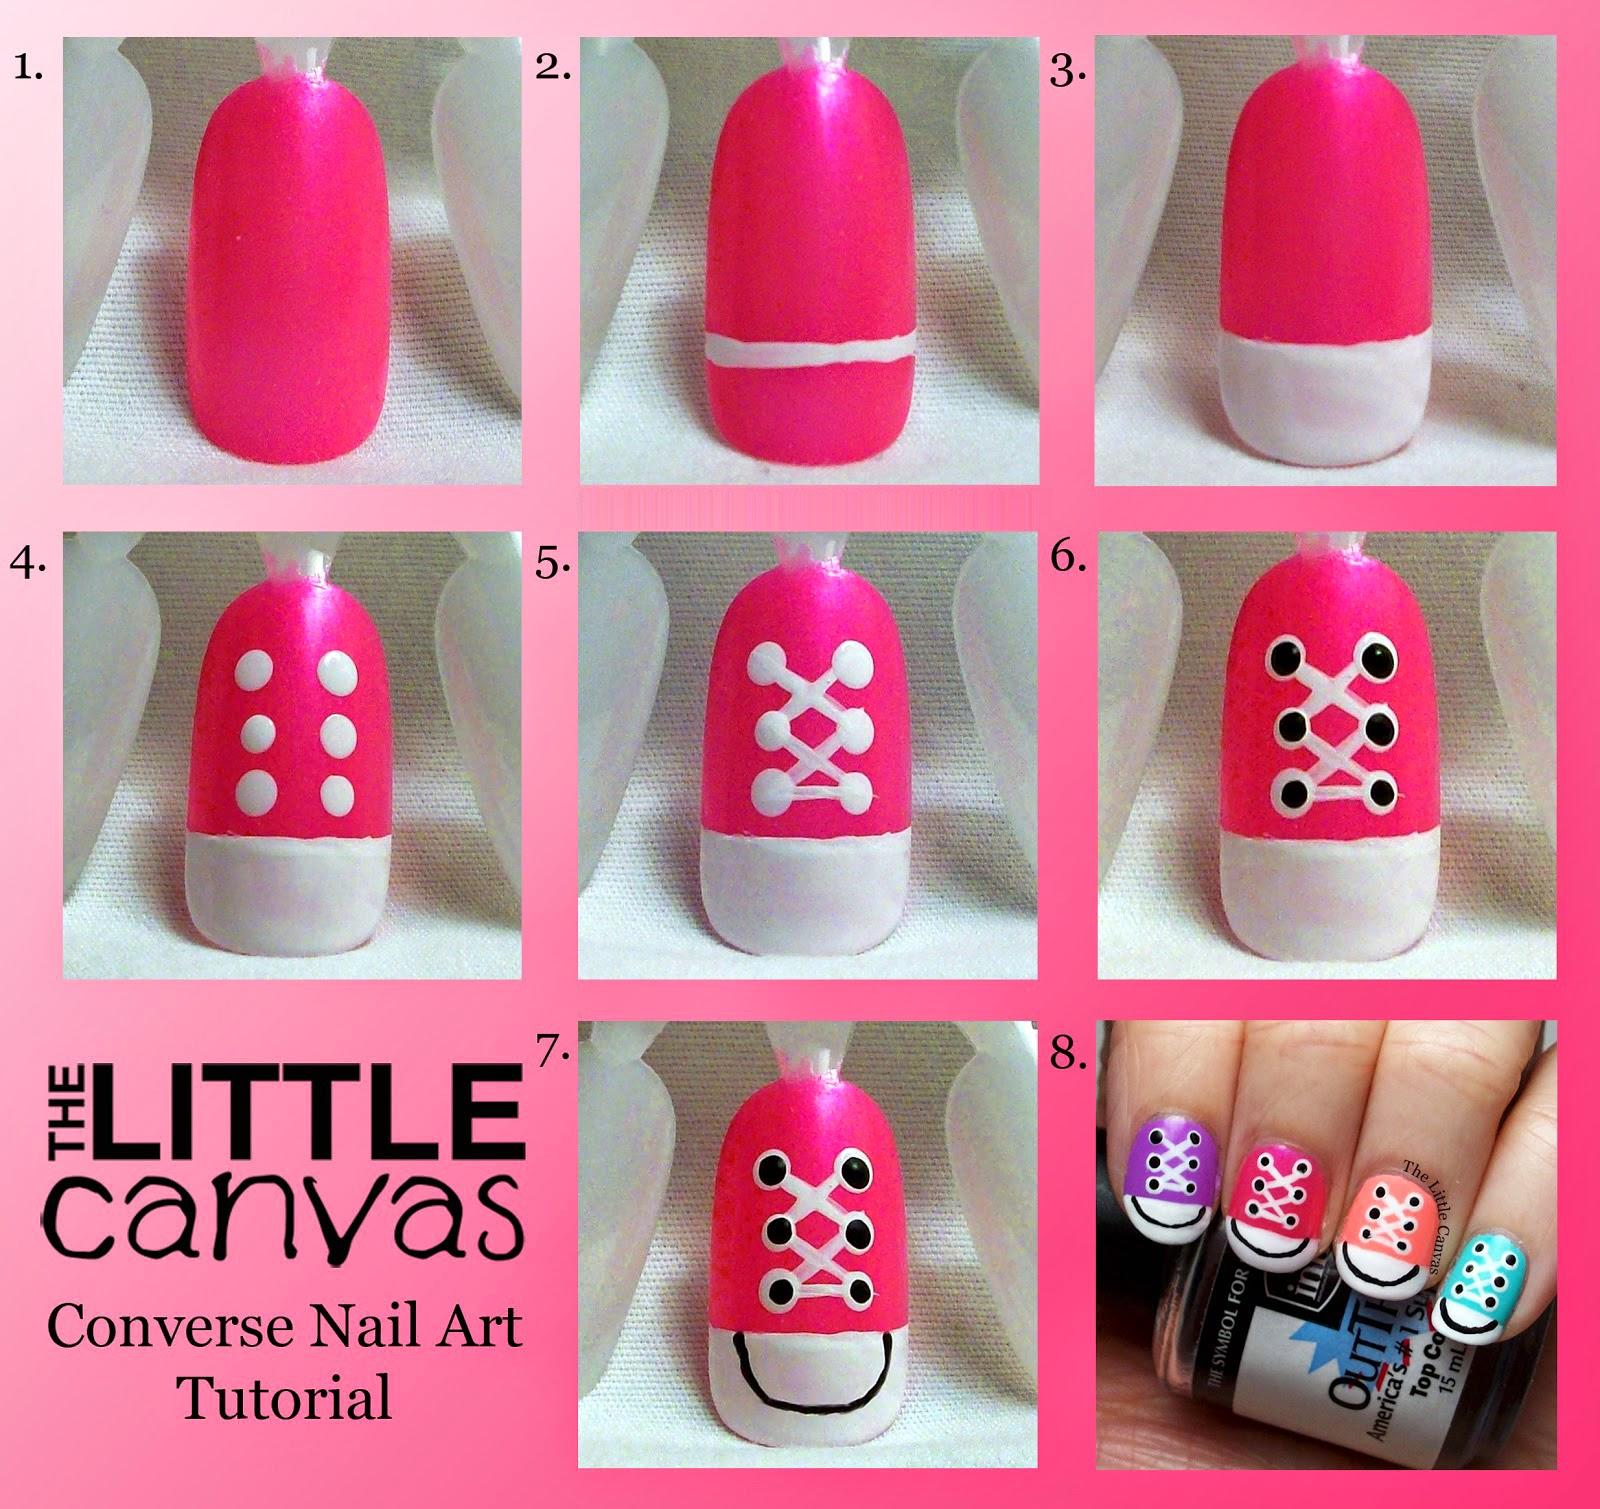 Converse Nail Art Step By Step ~ Entertainment News, Photos & Videos ...